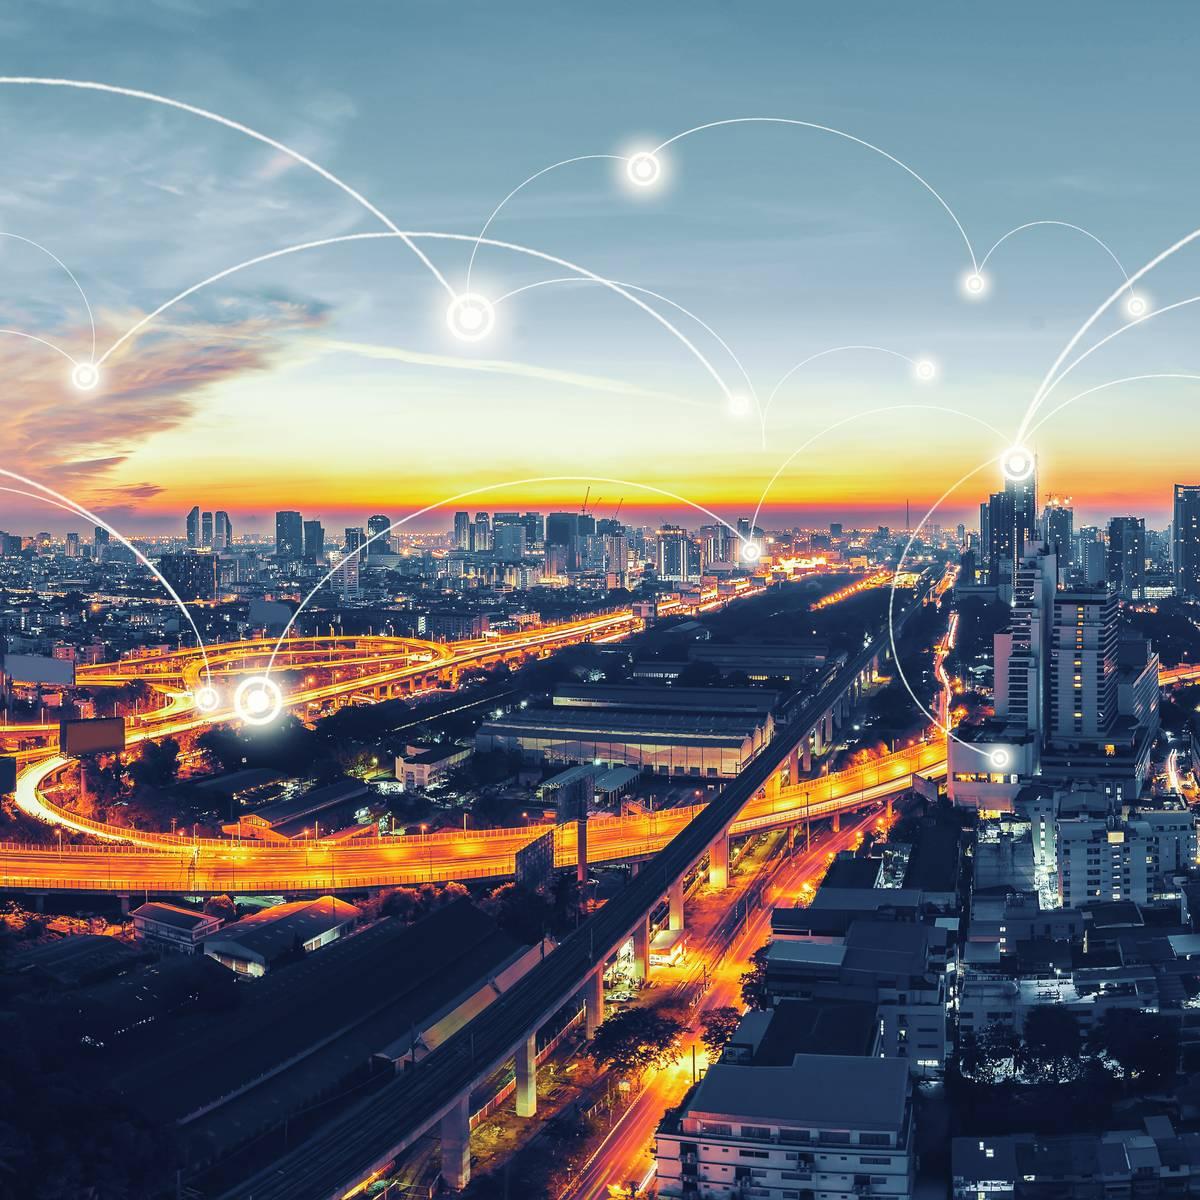 major-australian-telco-taps-marketing-evolution-to-drive-world-class-advertising-capabilities-1